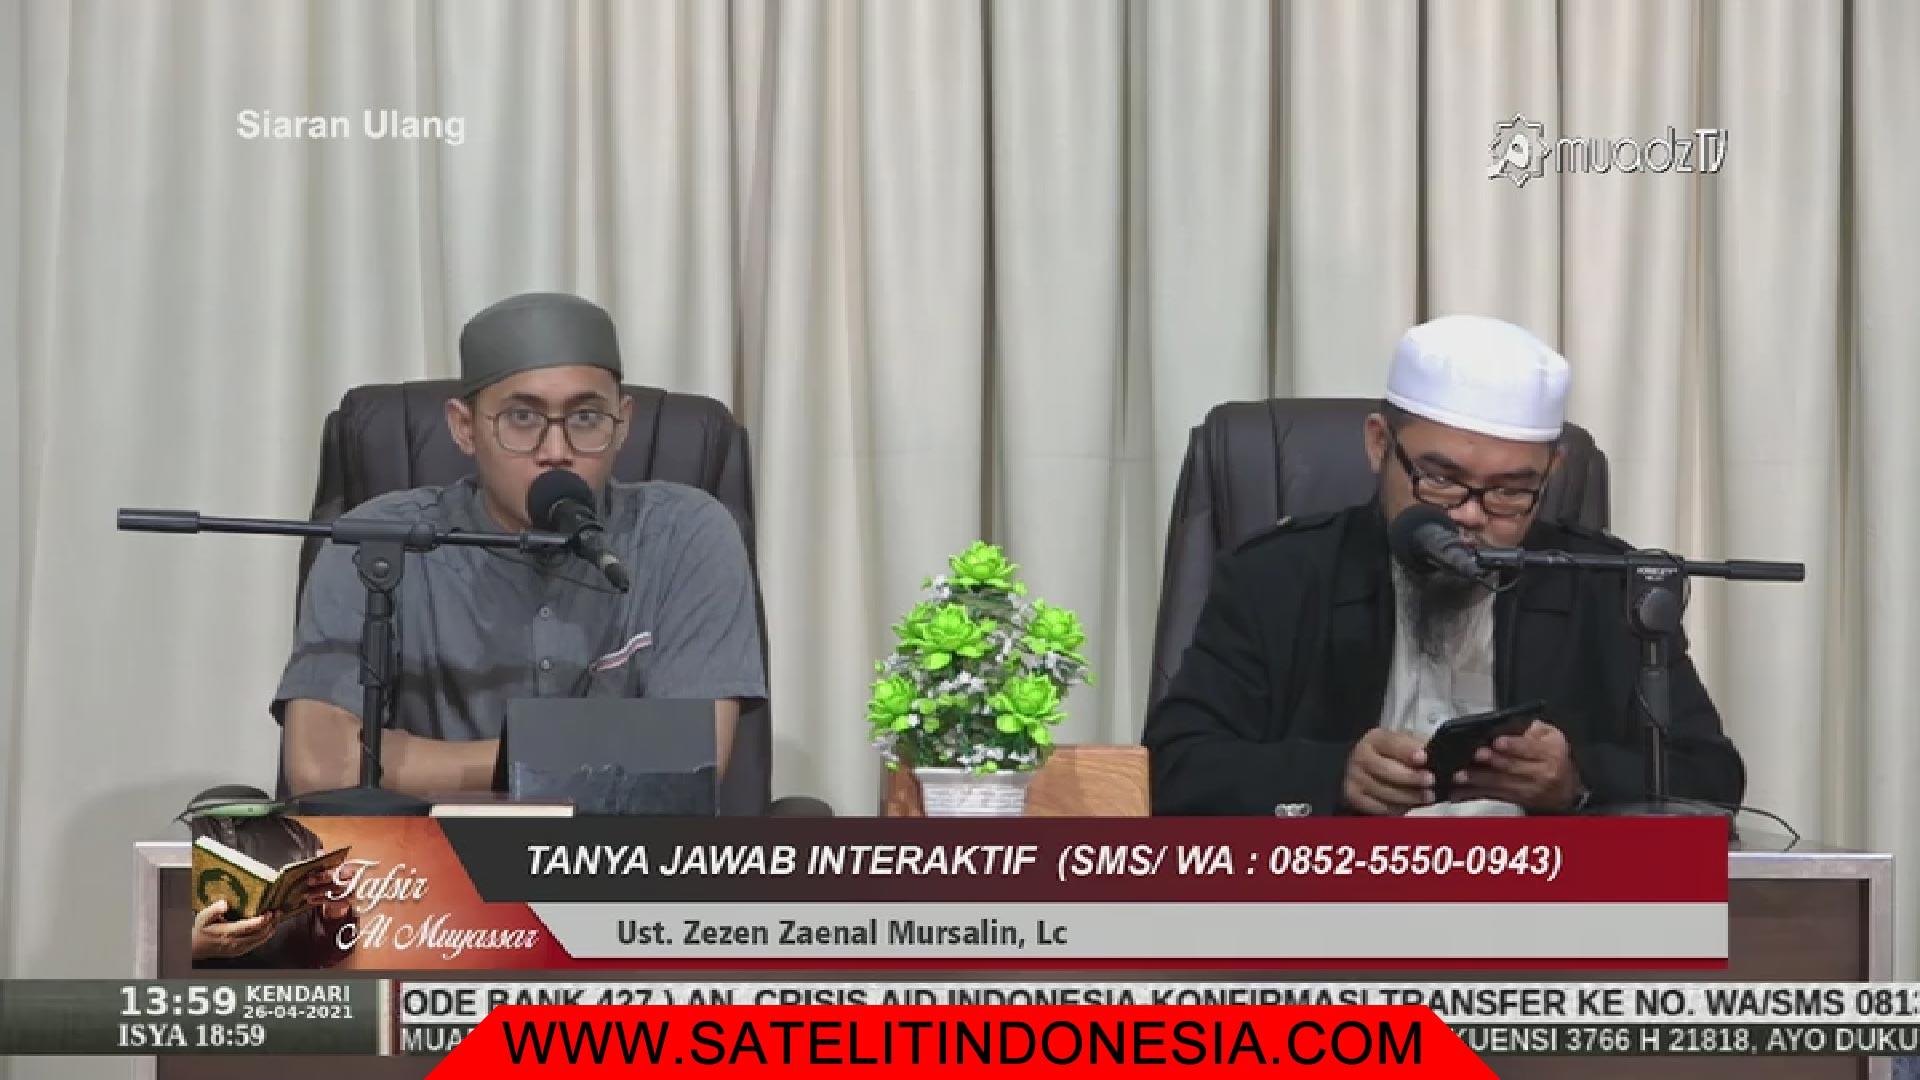 Frekuensi siaran Muadz TV di satelit Telkom 4 Terbaru